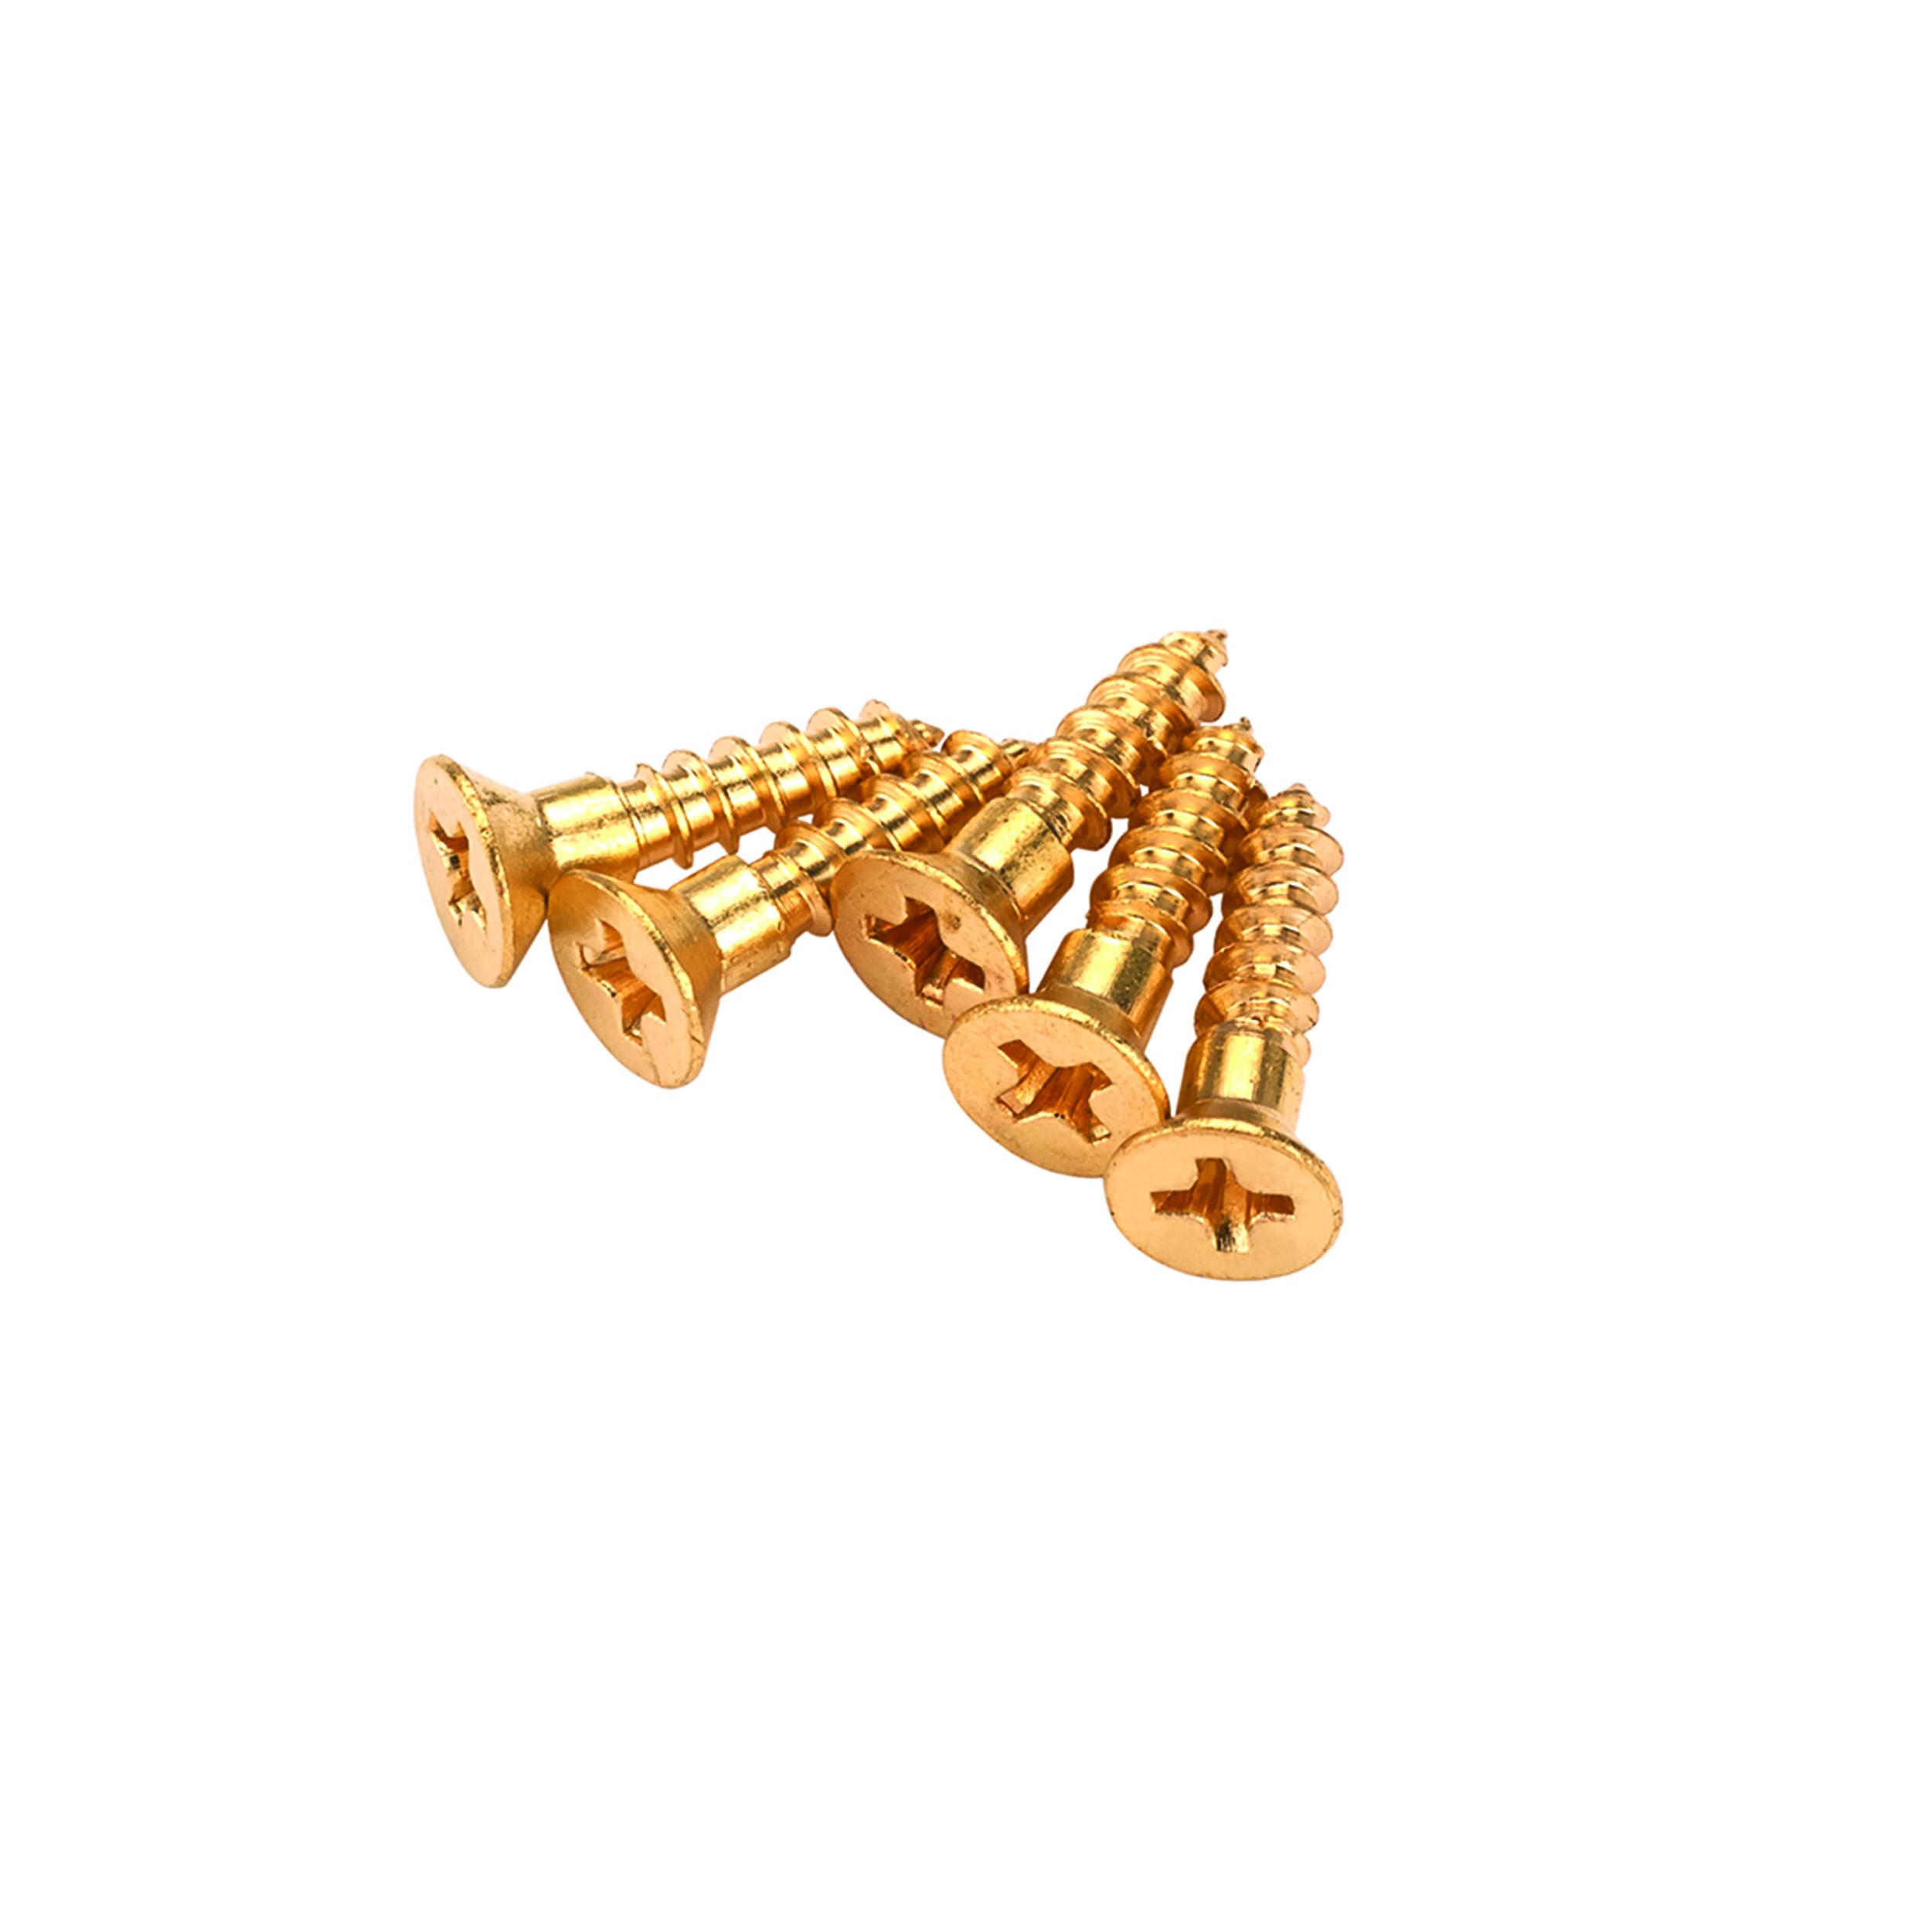 Solid Brass Screws #4 x 1/2